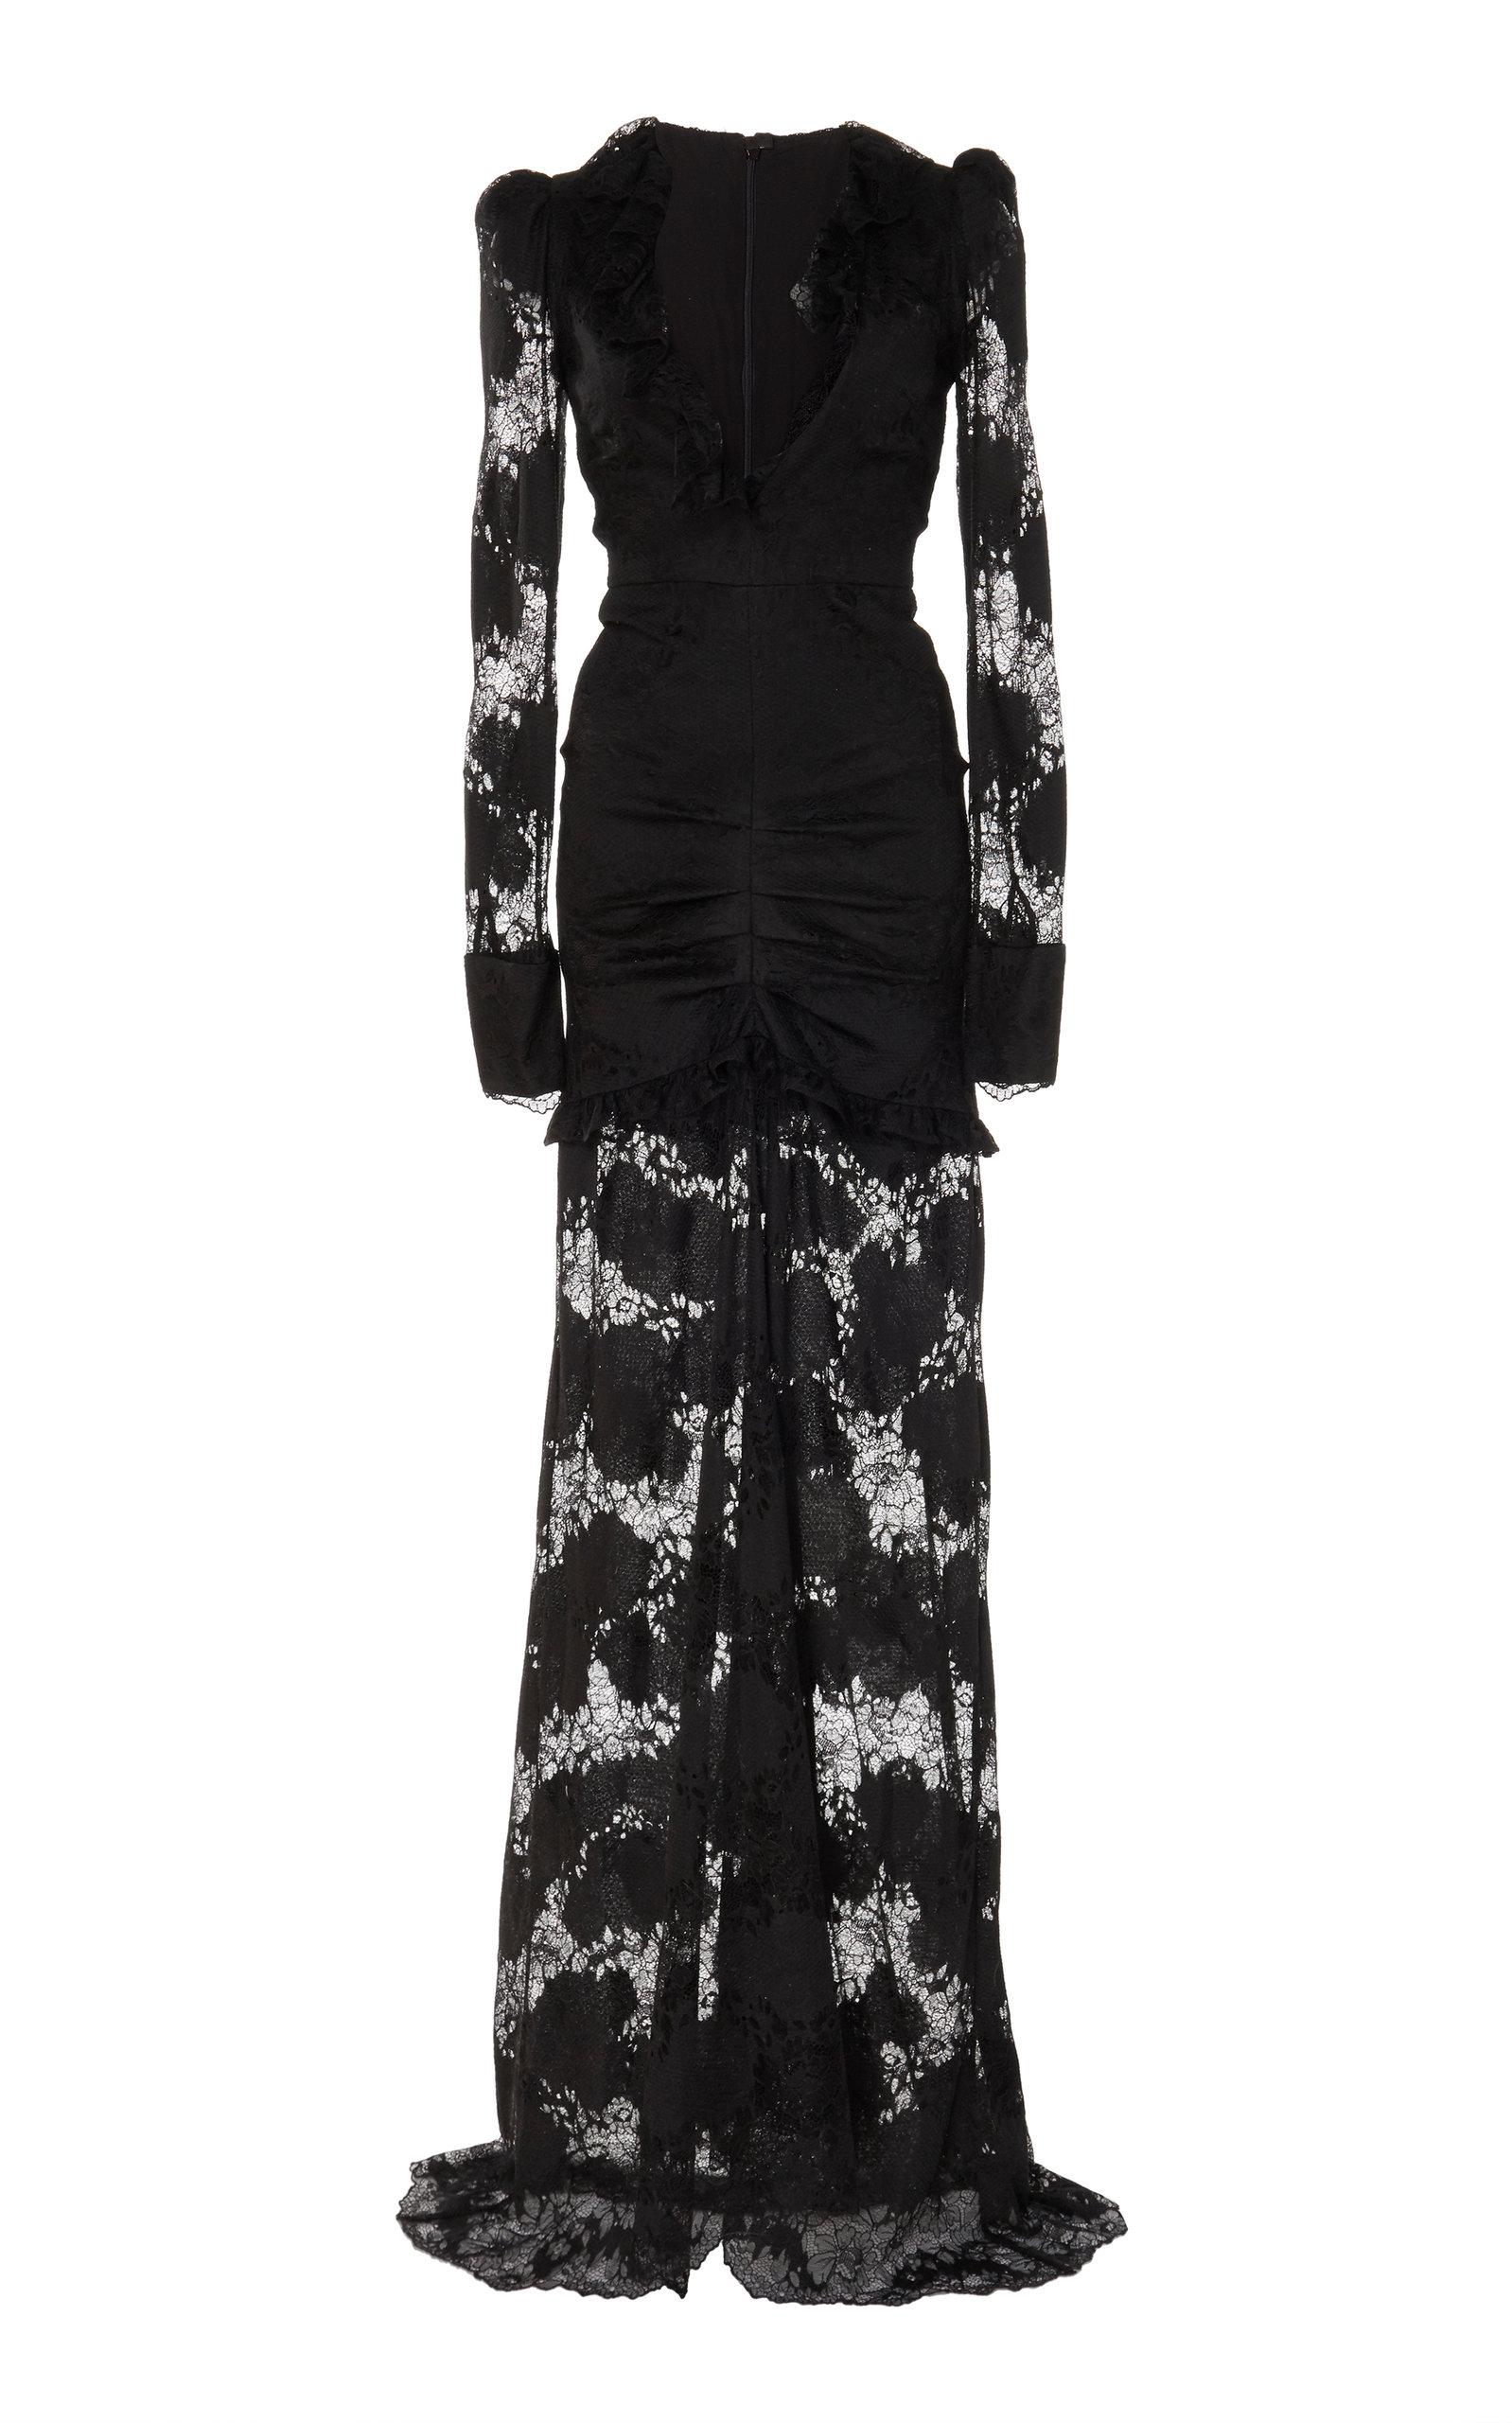 Alexis Dresses Lucasta Lace-Detailed Deep-V Maxi Dress